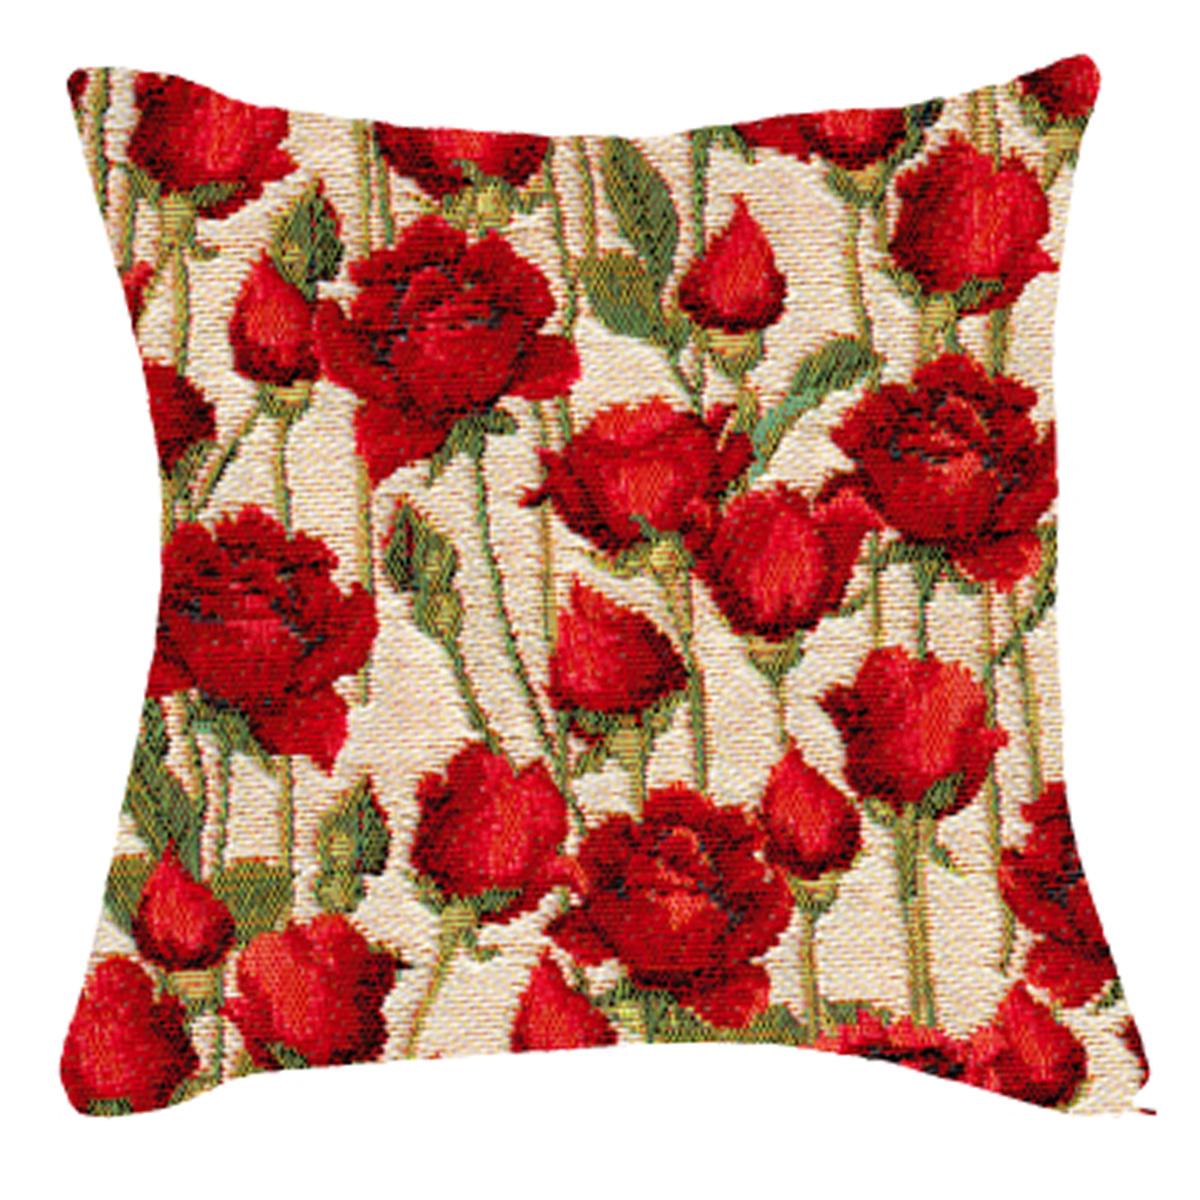 Coussin artisanal \'Royal Tapisserie\' blanc rouge (roses rouges)  - 36x36 cm - [Q6354]